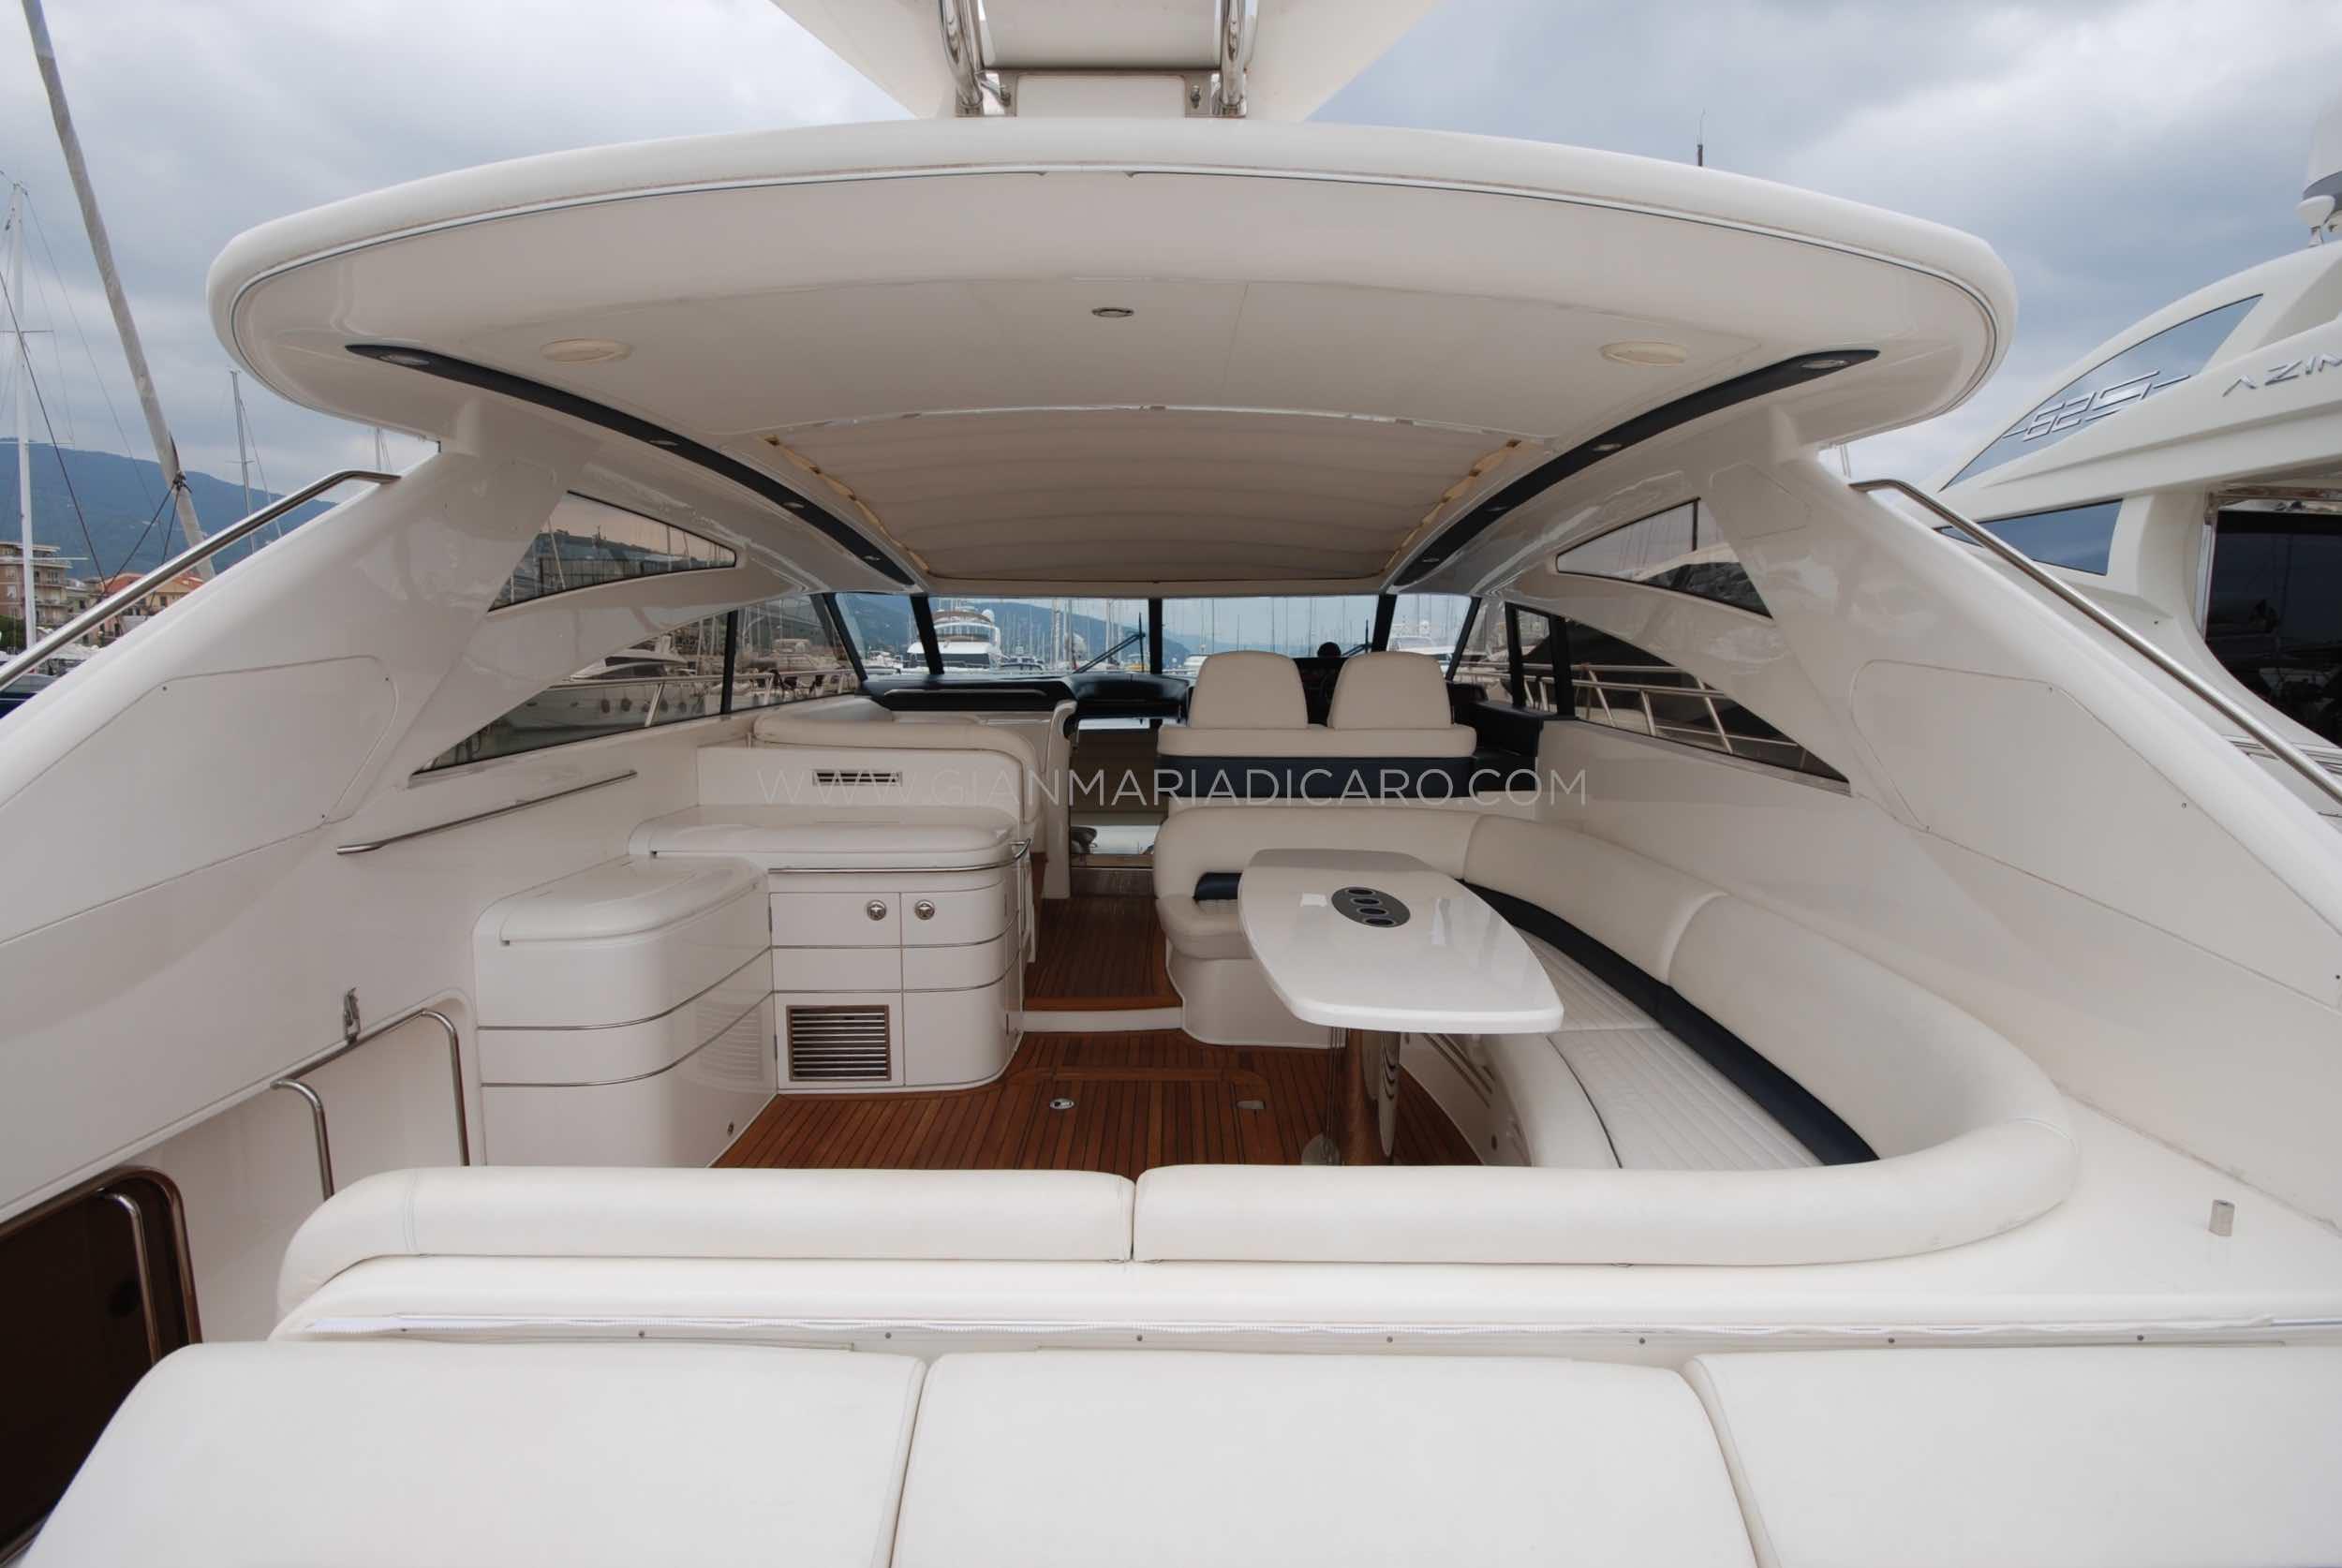 princess-yachts-v58-maestro-di-vita-for-sale-5.jpg